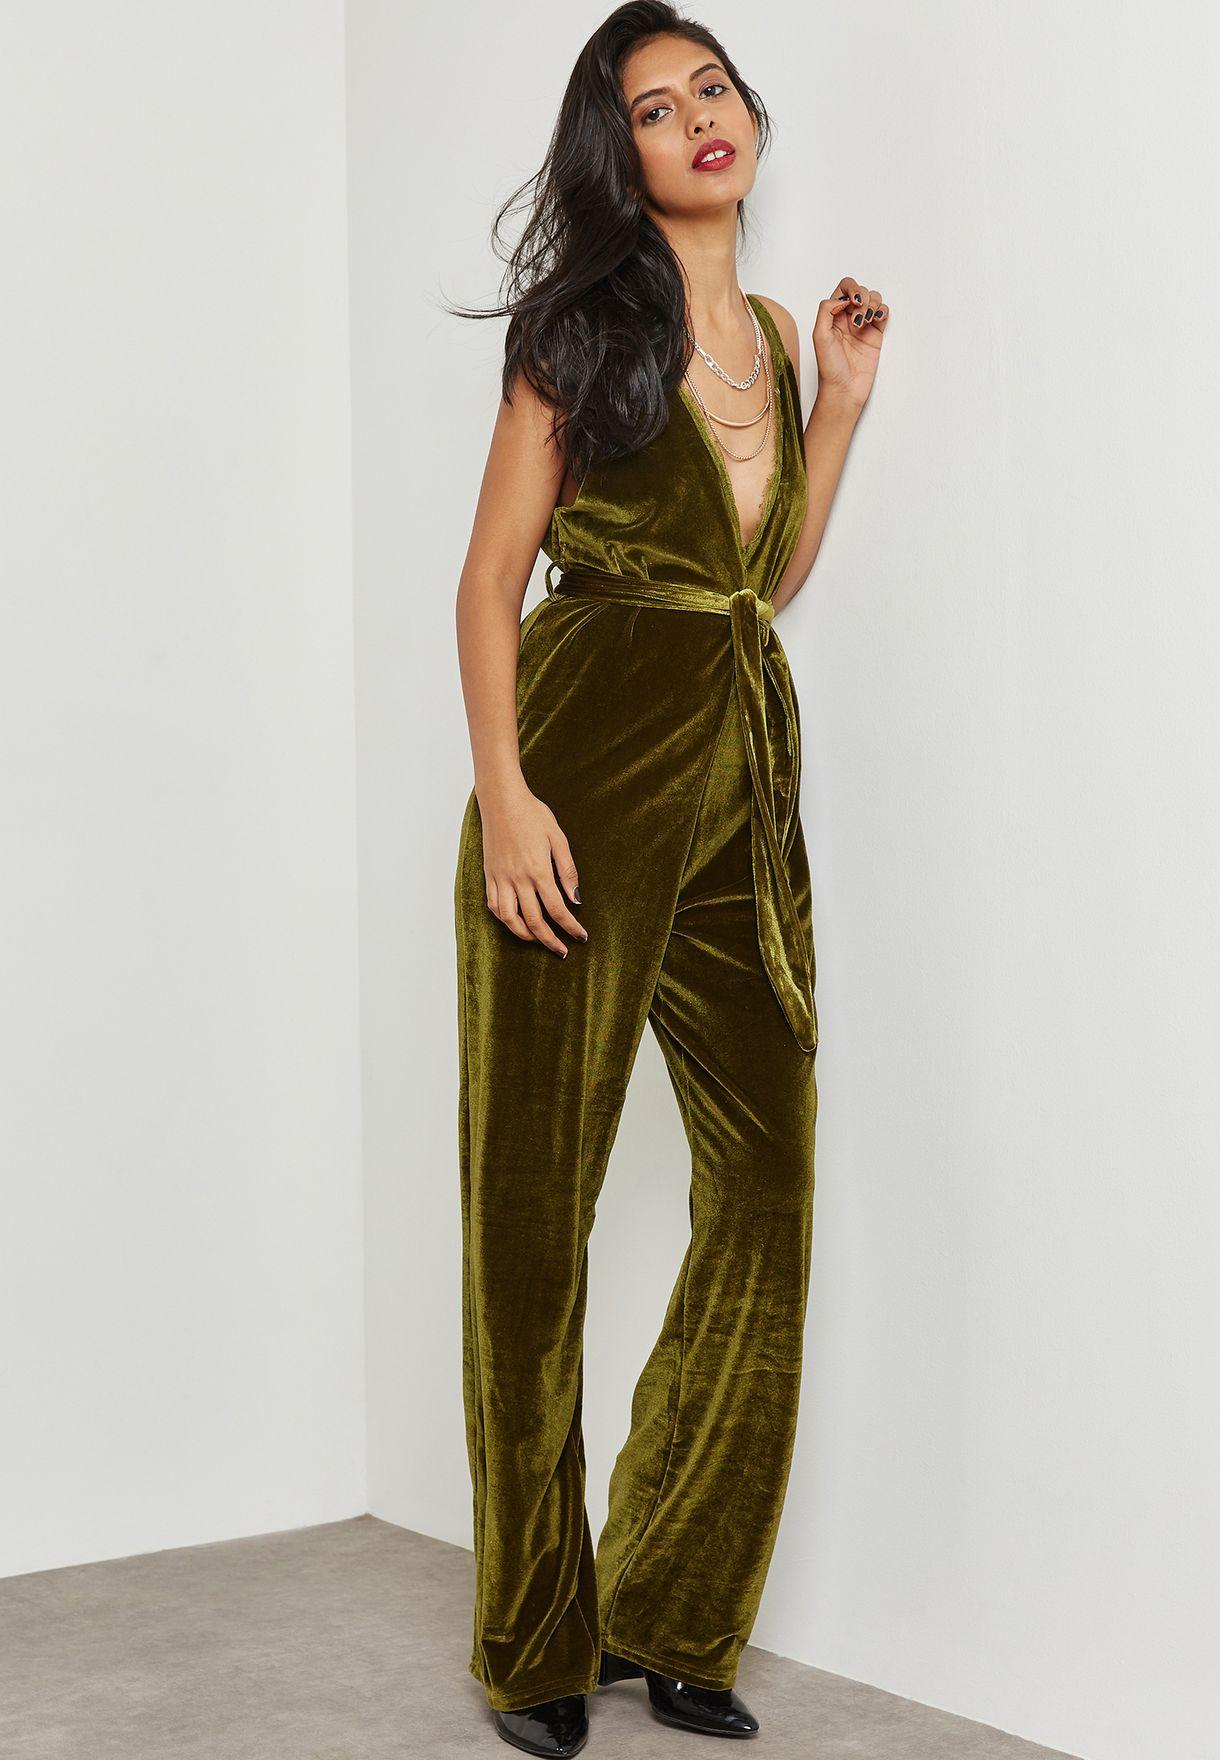 a94fdcfcc7d Shop Wyldr green Plunge Velvet Jumpsuit WALK AWAY for Women in UAE ...